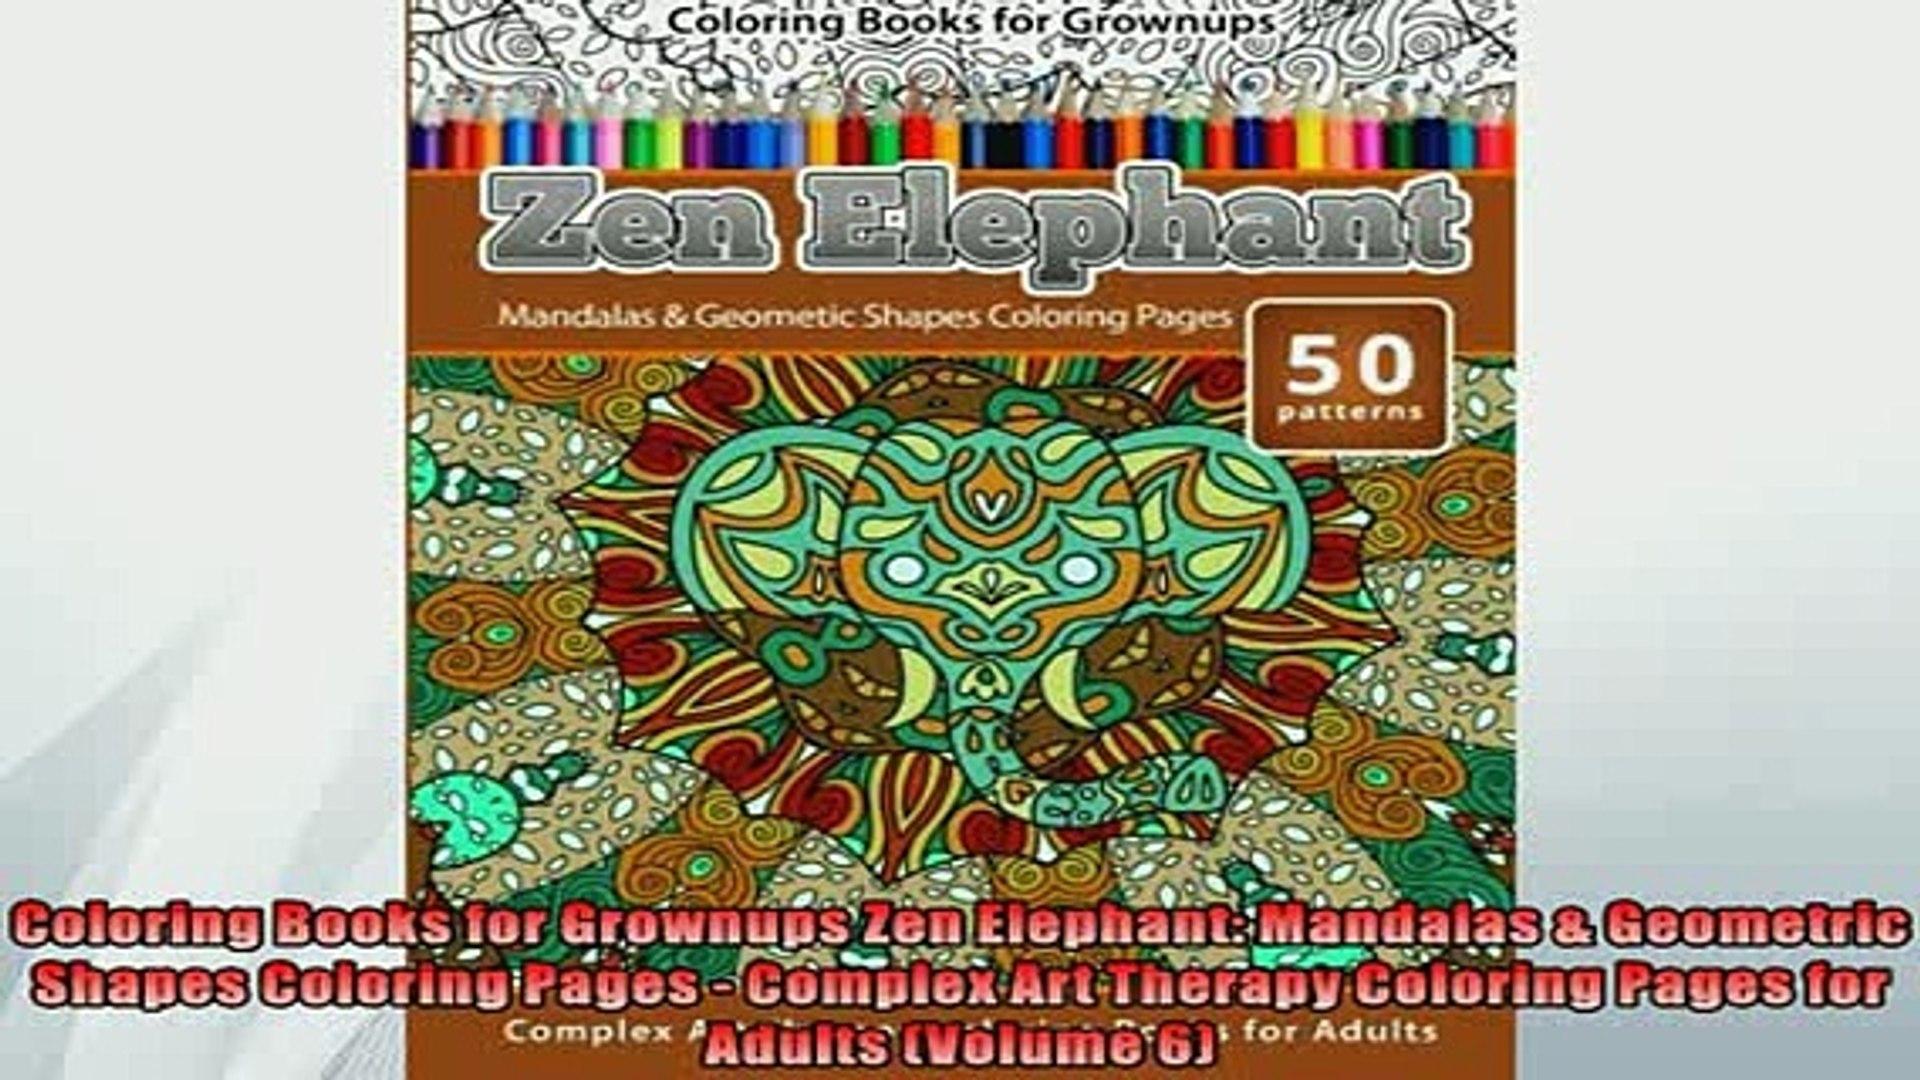 Free Pdf Downlaod Coloring Books For Grownups Zen Elephant Mandalas Geometric Shapes Coloring Pages Download Online Video Dailymotion